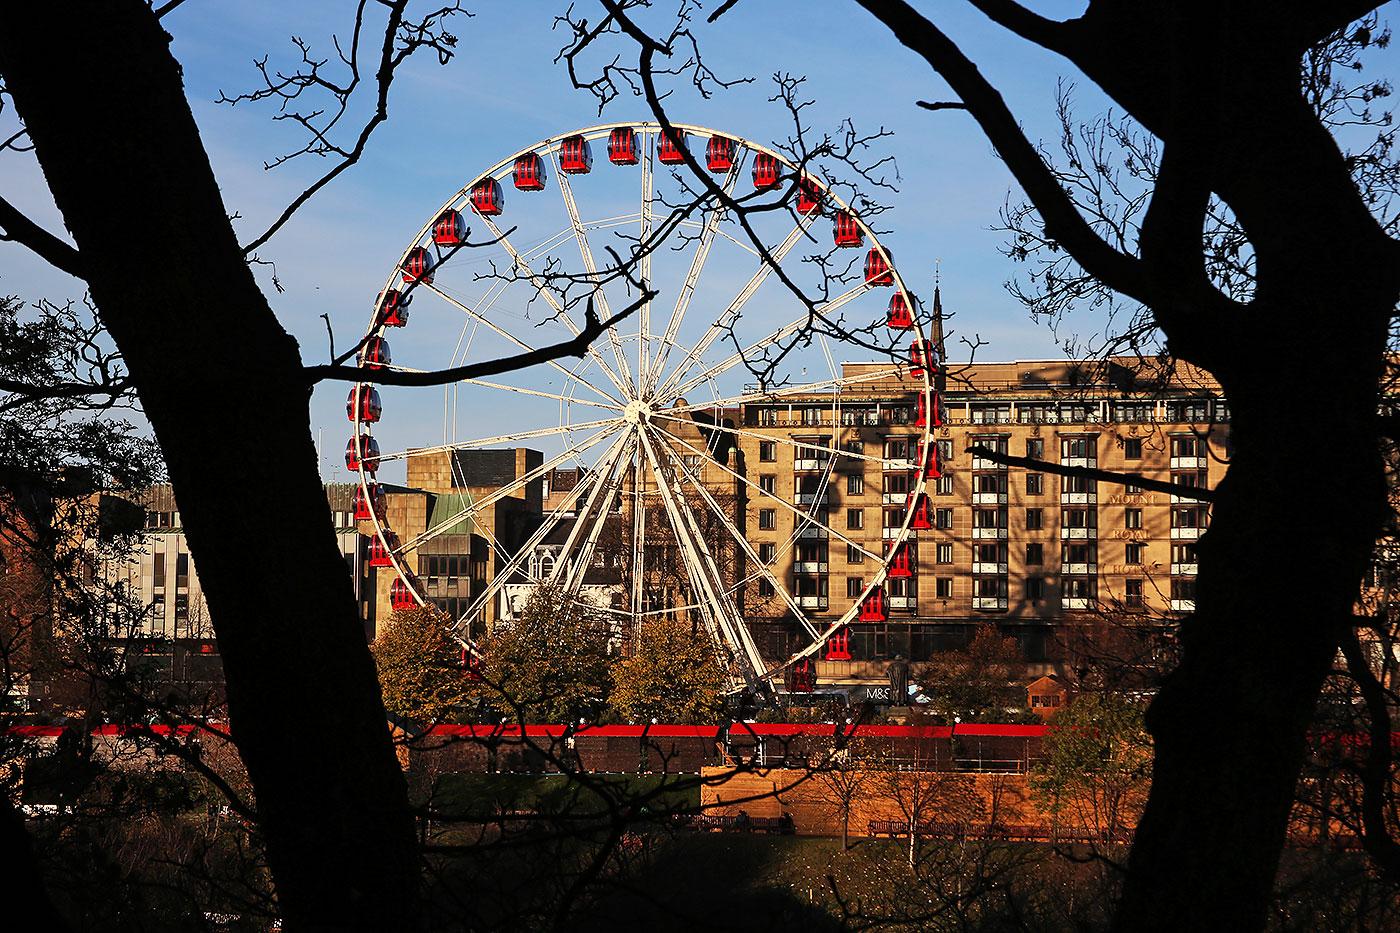 Edinburgh\'s Christmas 2013 - The Edinburgh Wheel in East Princes ...